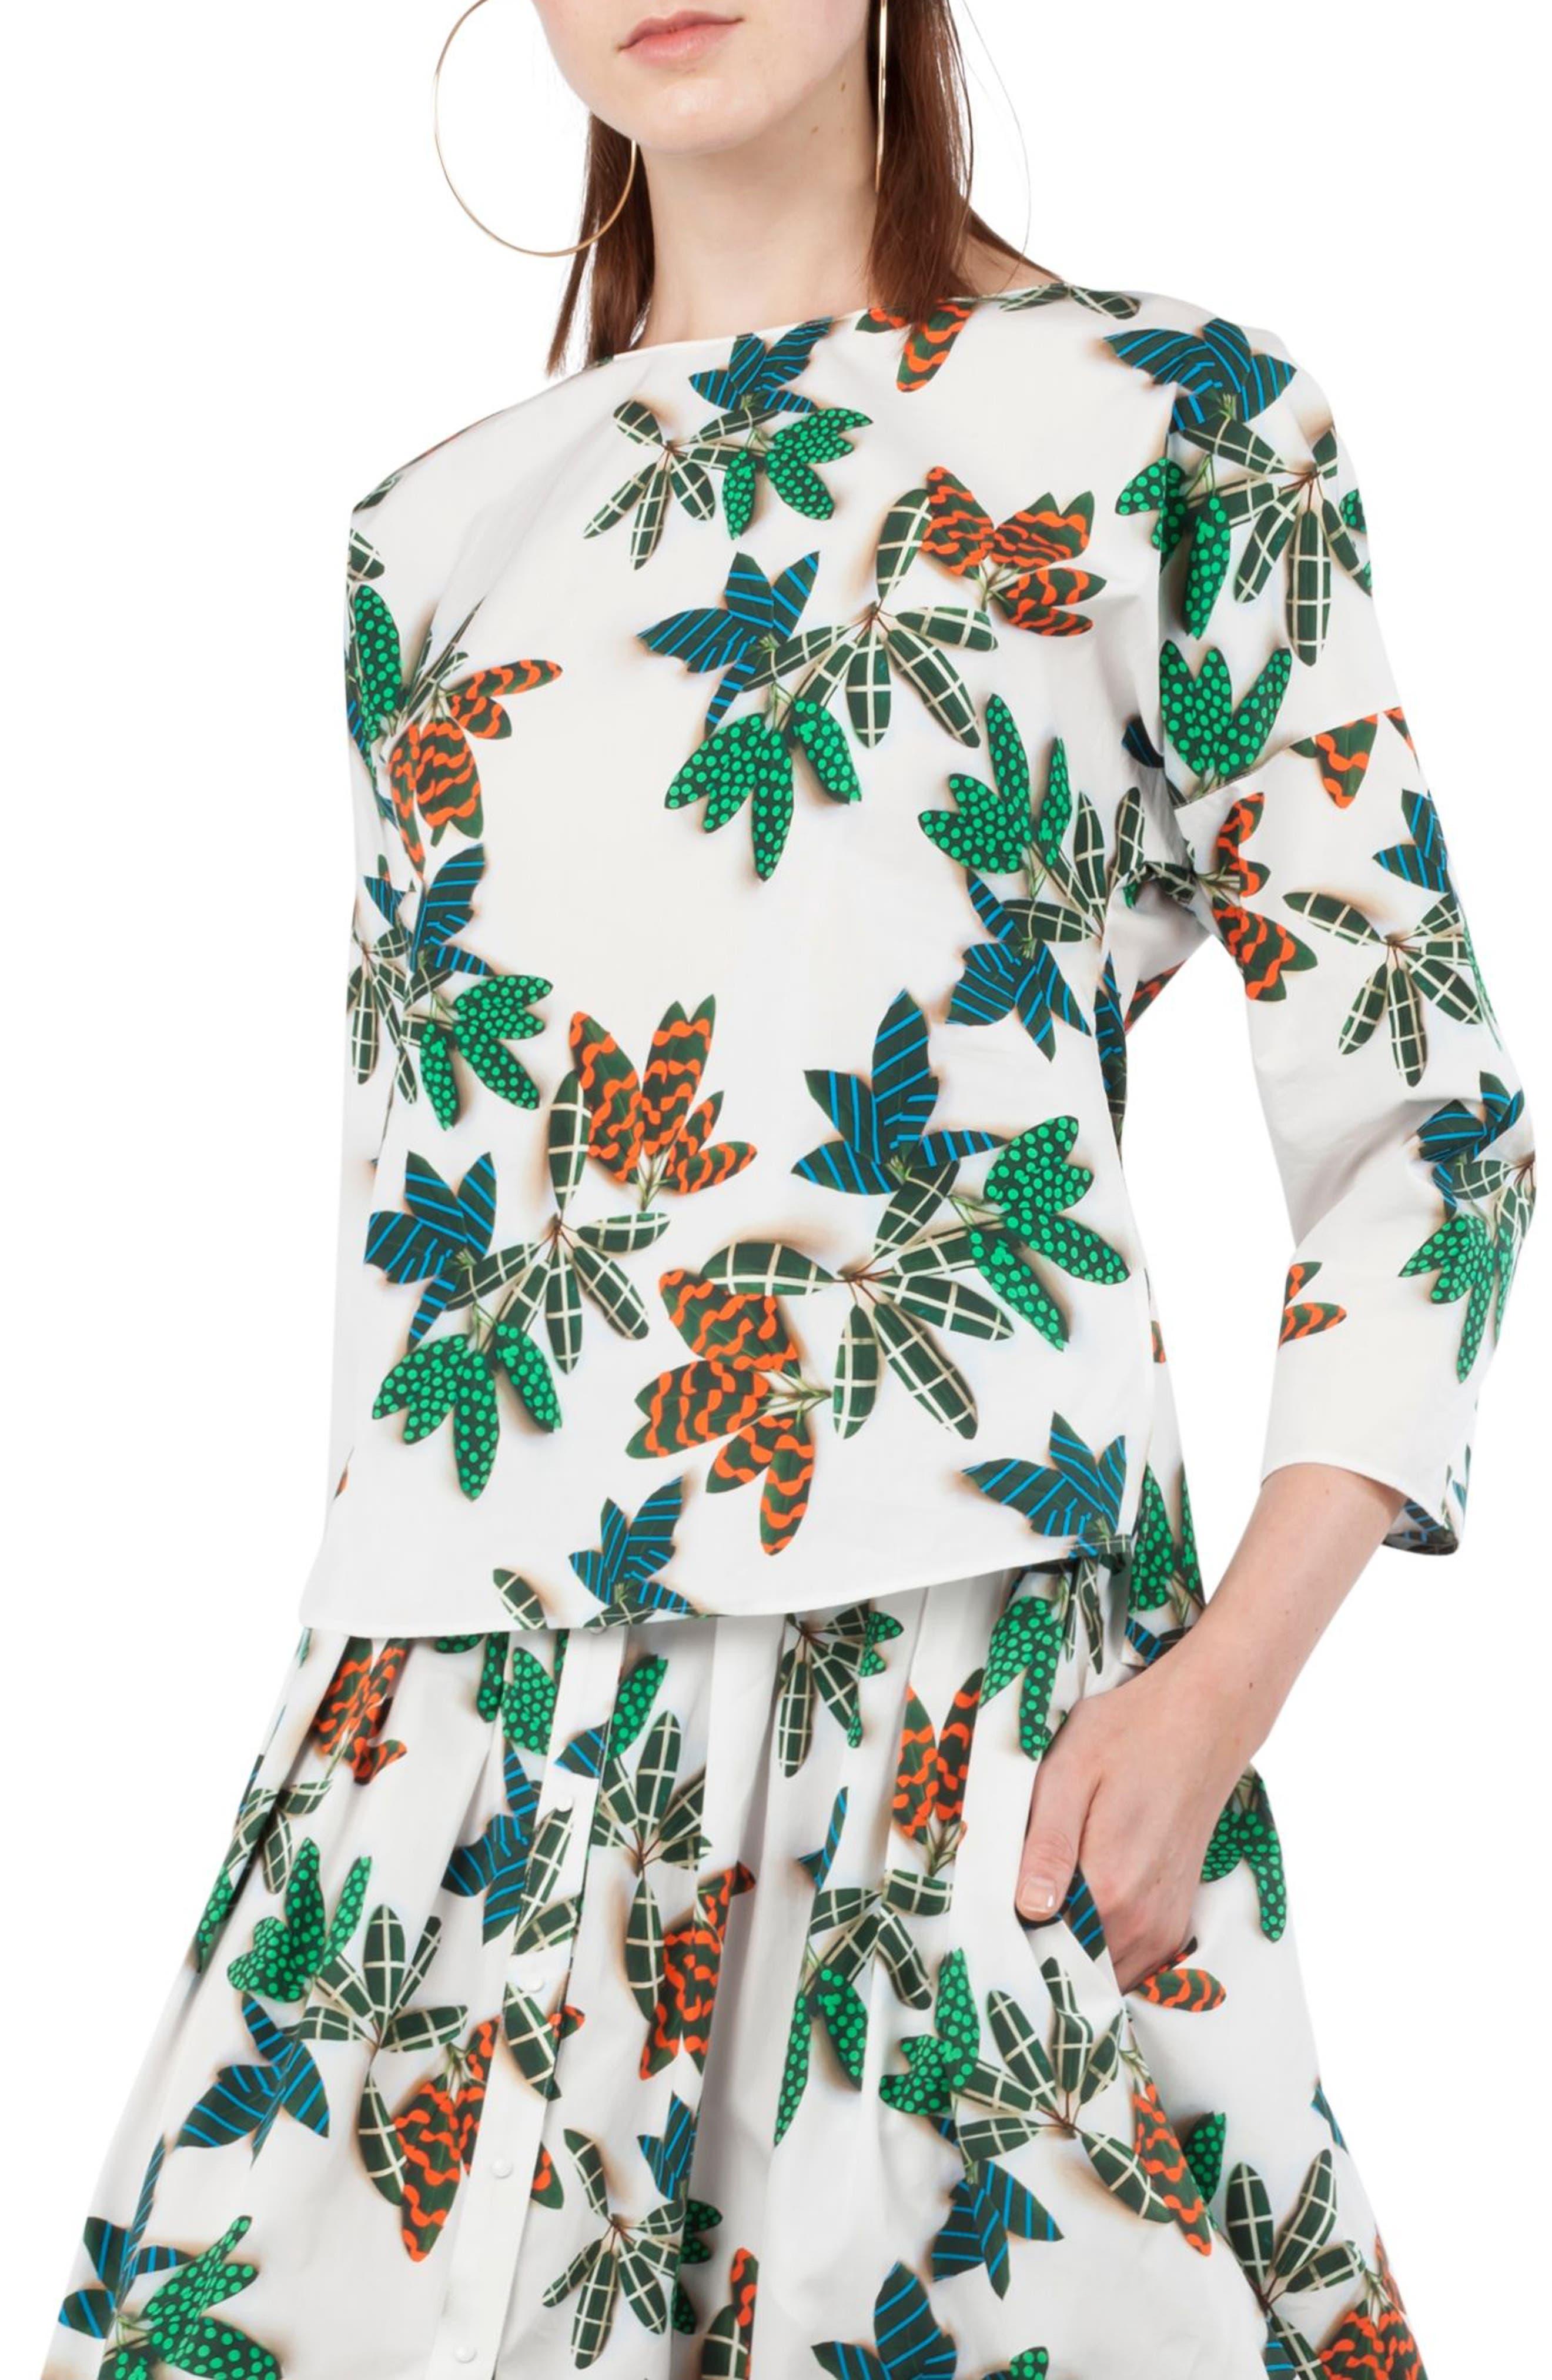 Alternate Image 1 Selected - Akris punto Tropical Print Cotton Blouse